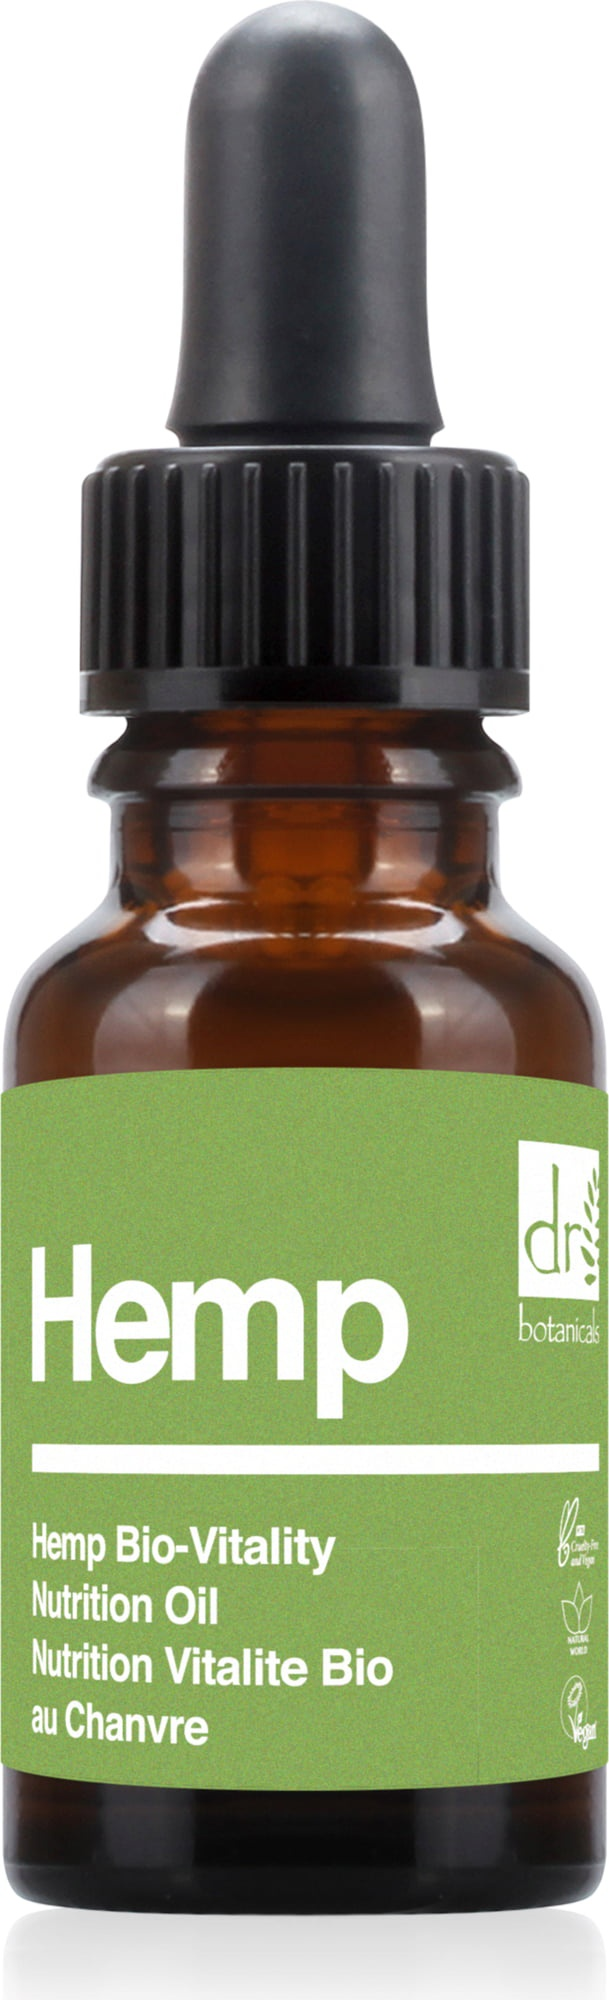 Dr Botanicals Hemp Oil